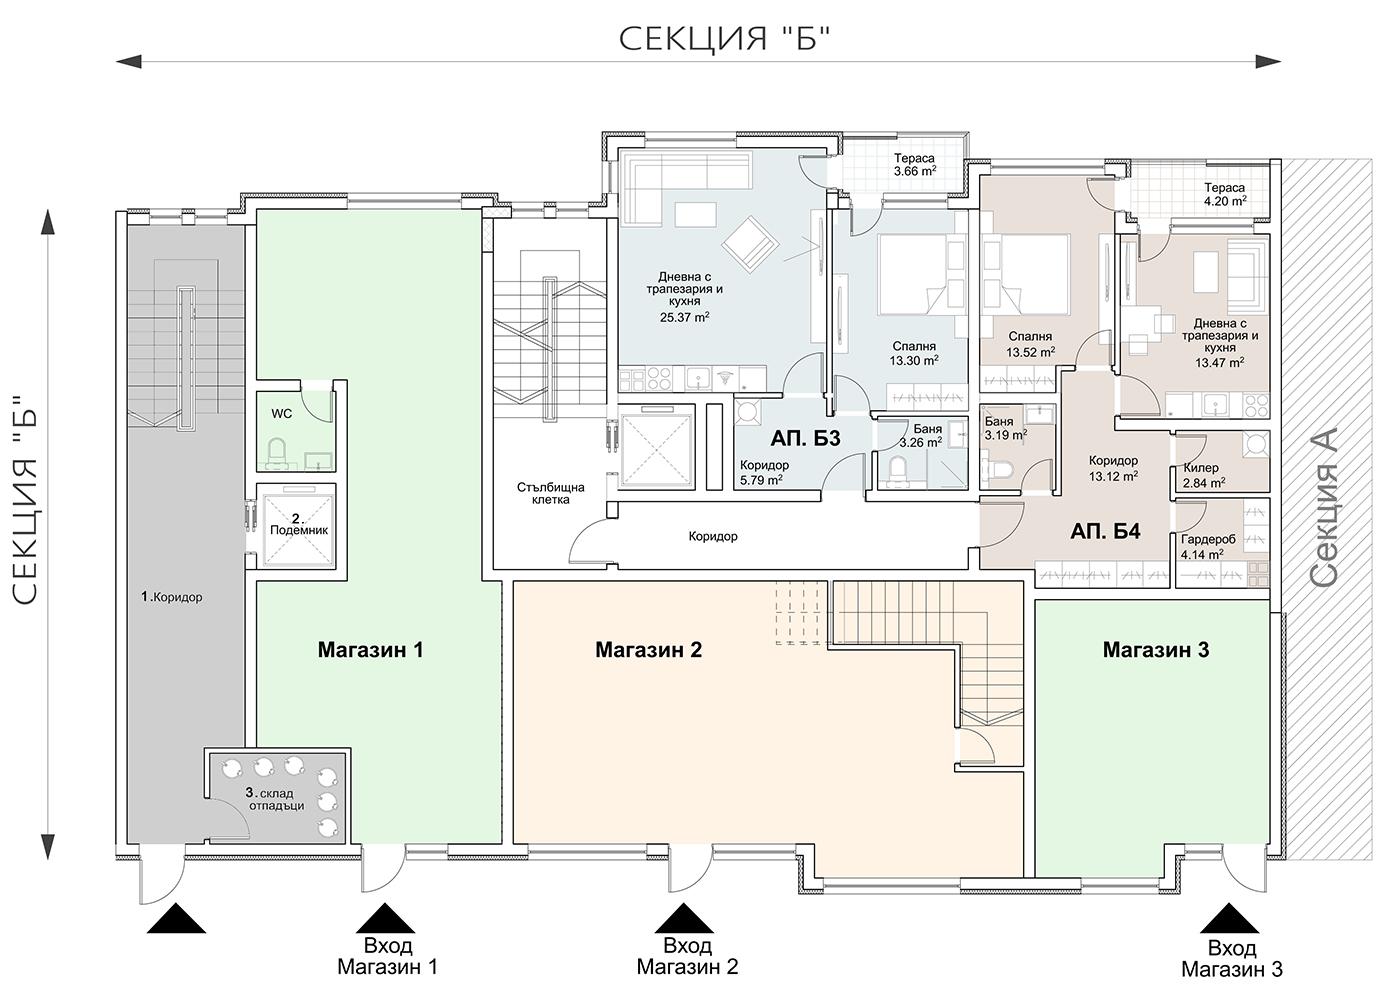 Сграда 8, вход Б, ет. 2